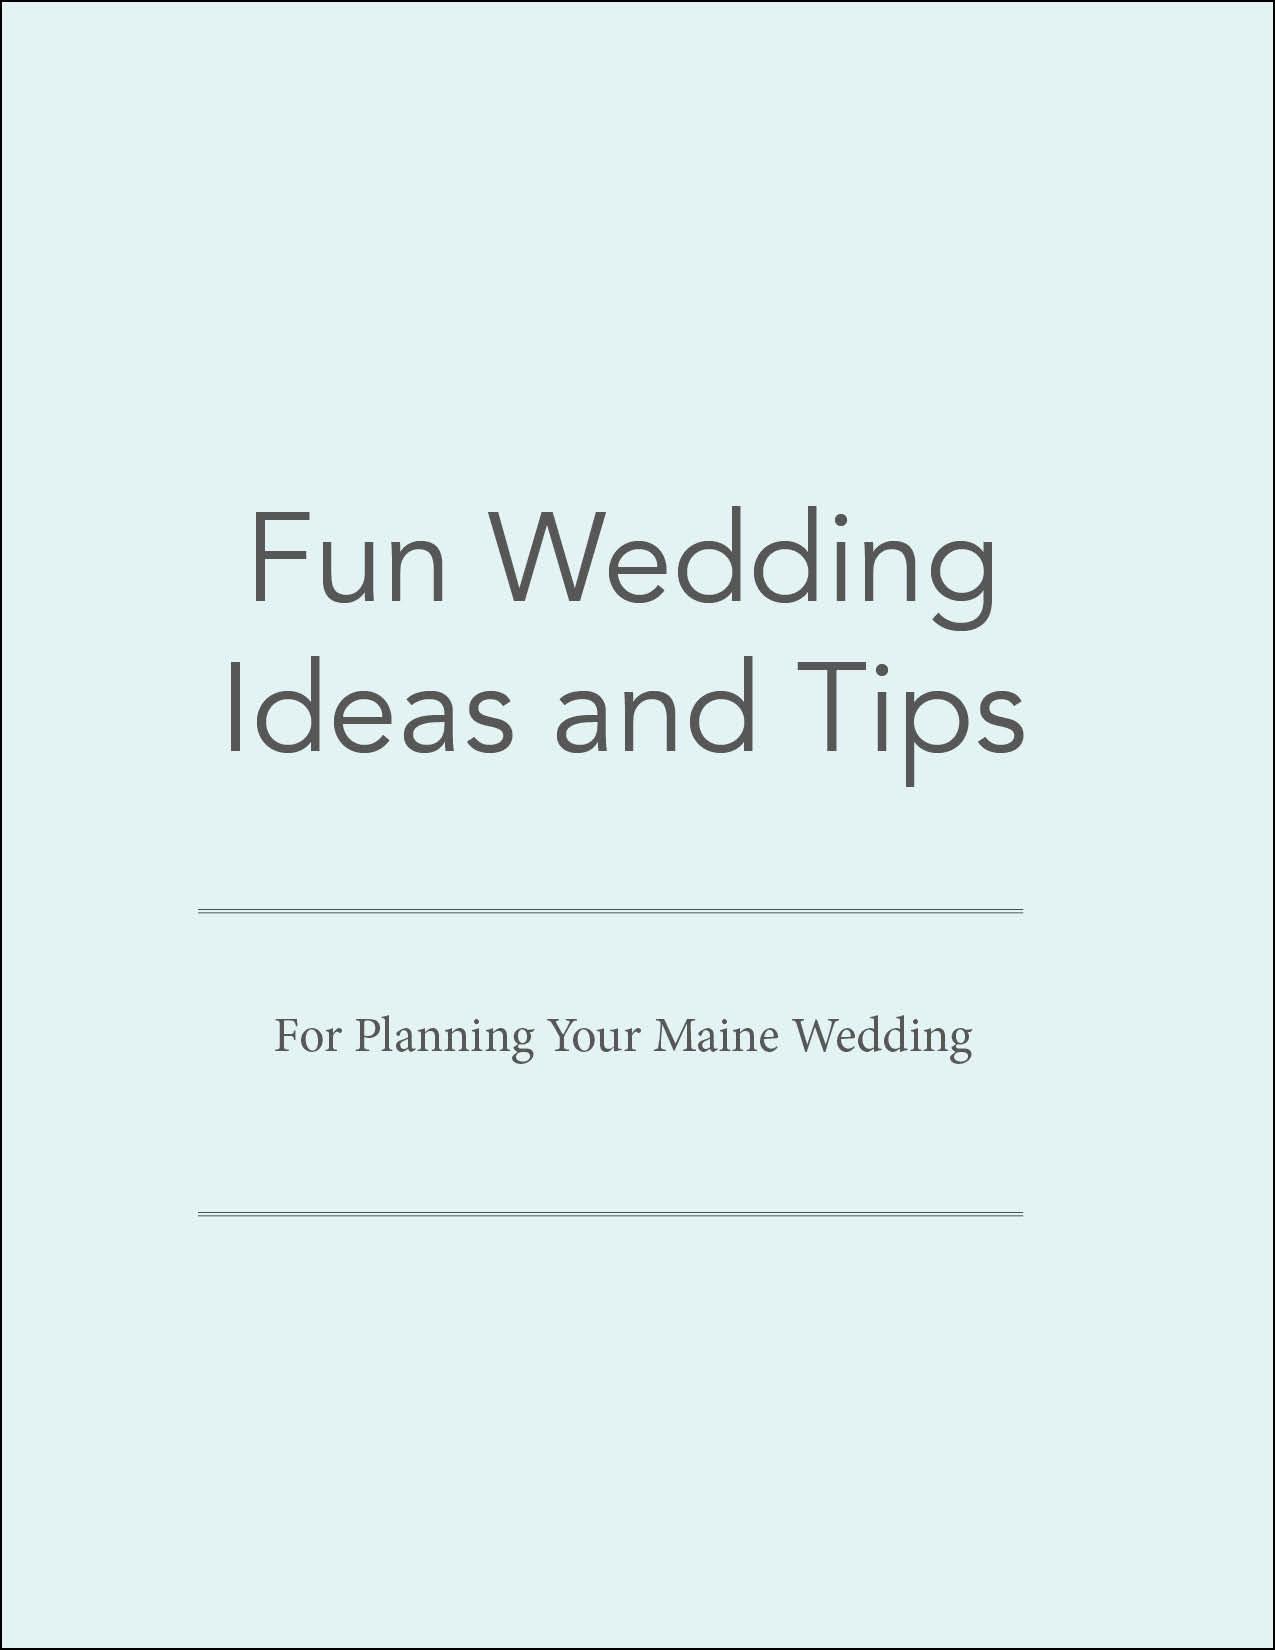 Fun Wedding Ideas and Tips